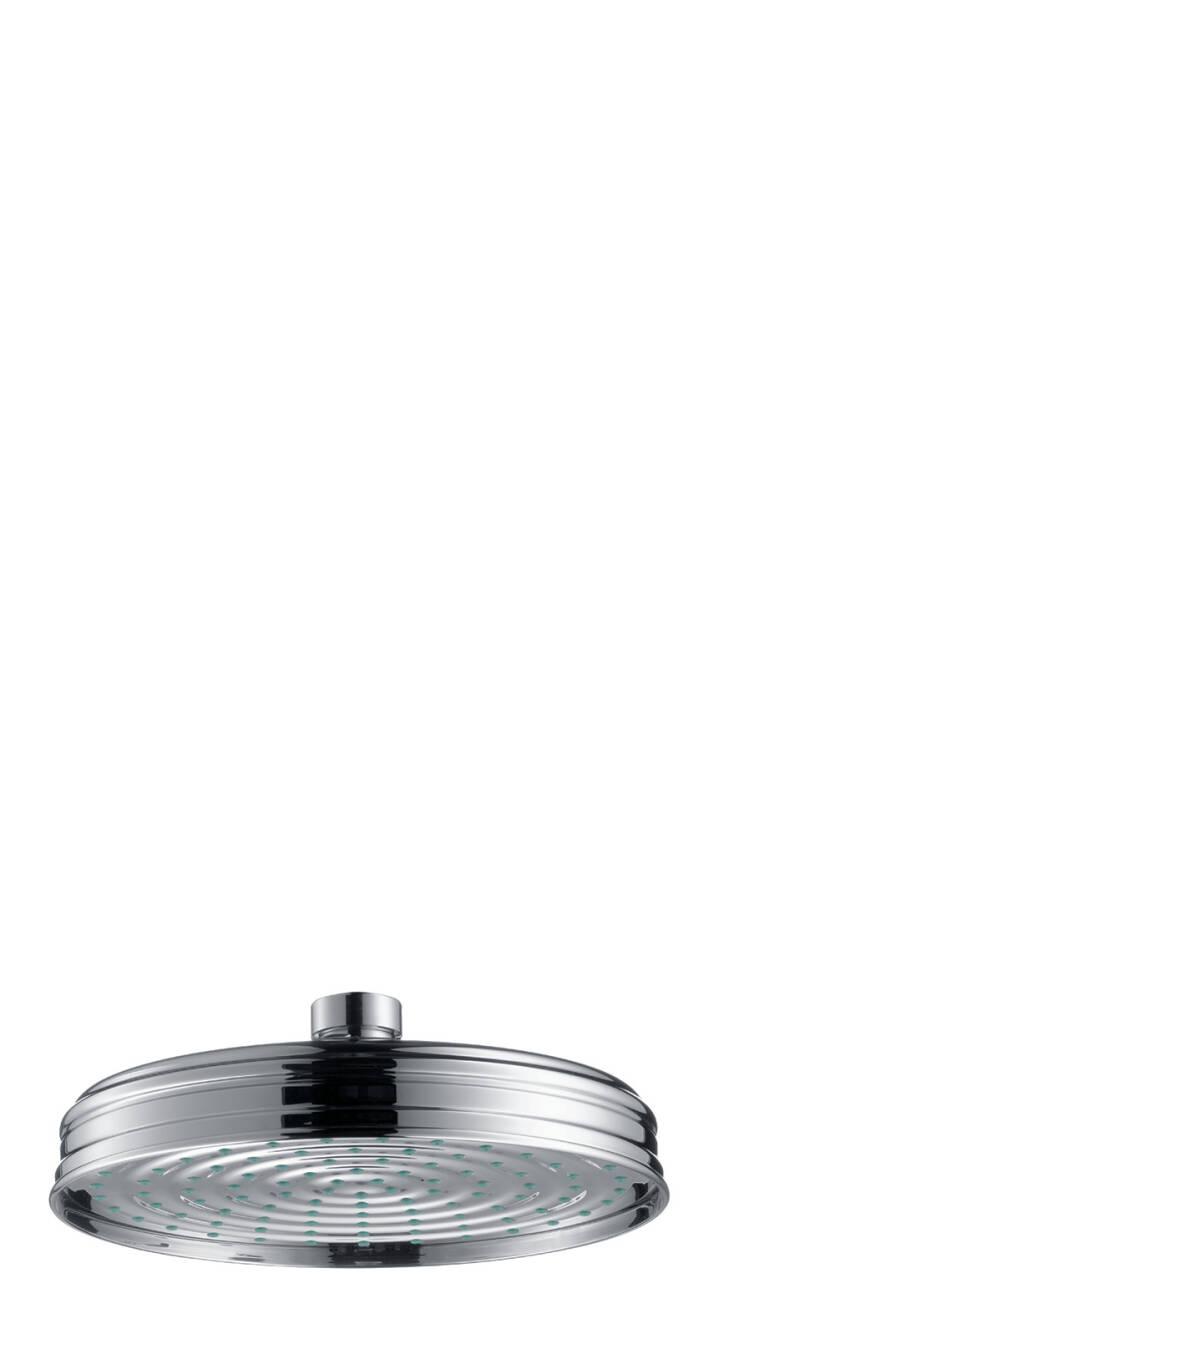 Overhead shower 180 1jet Classic, Chrome, 28487000